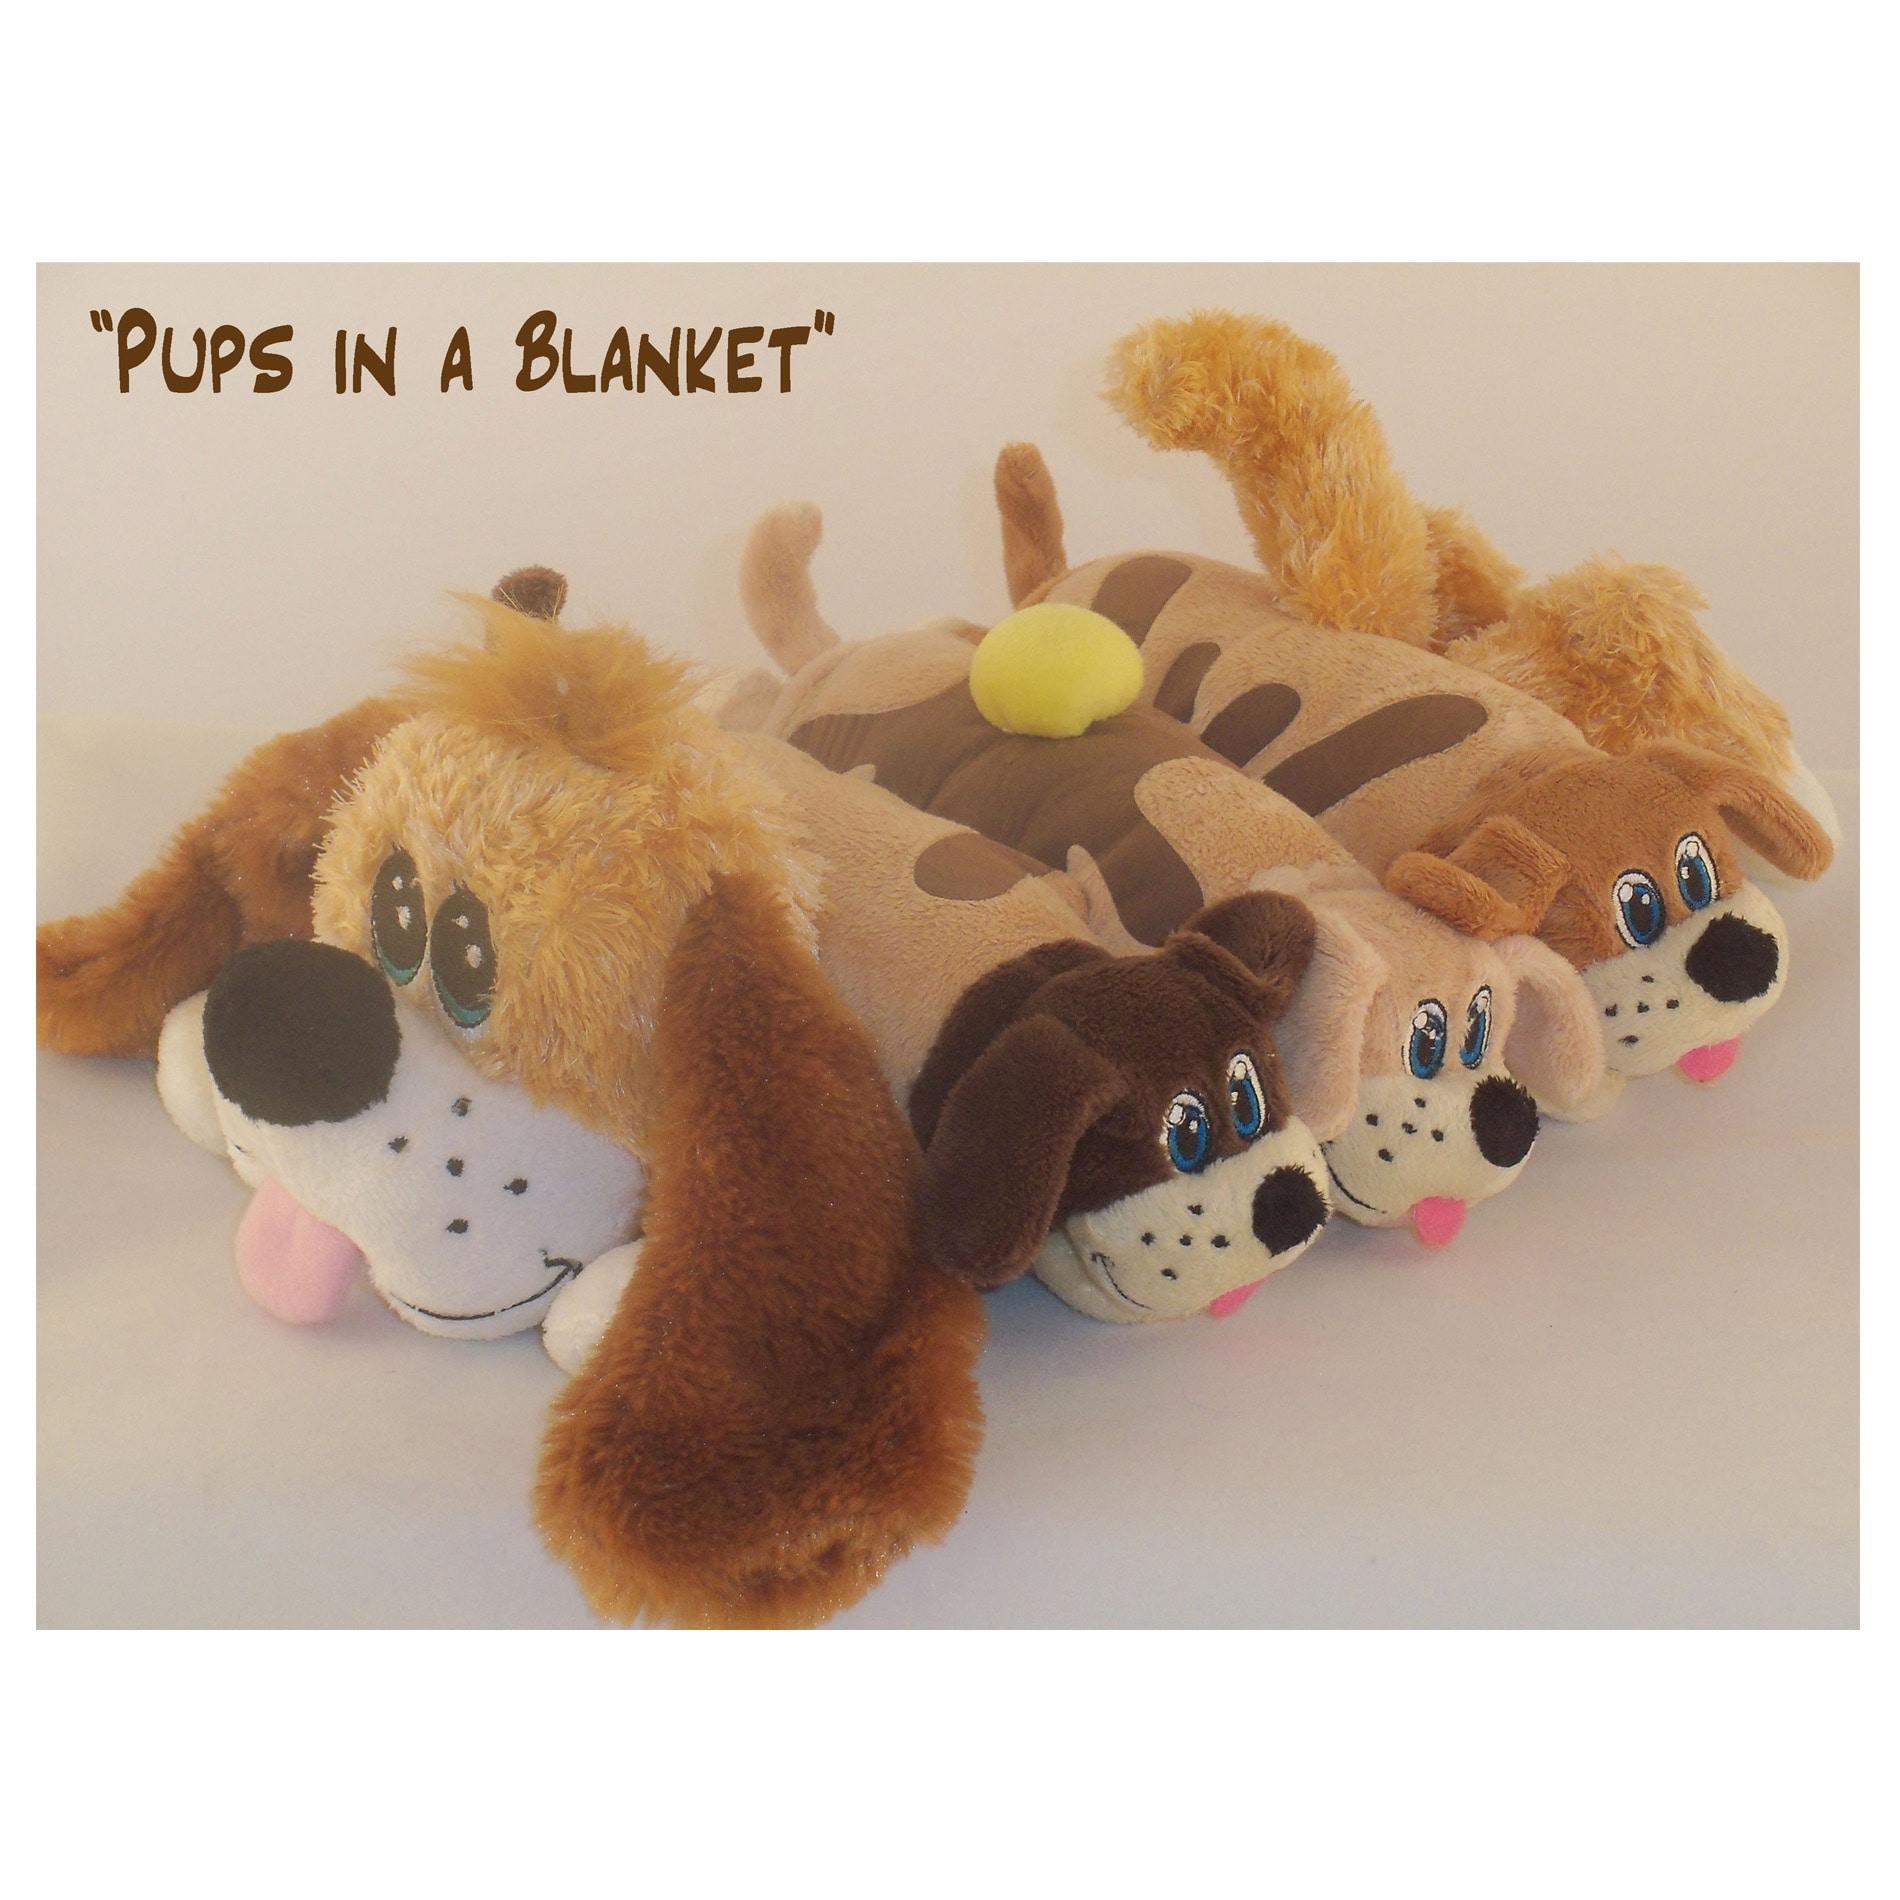 Pancake Puppy 'Pups in a Blanket' Stuffed Animal